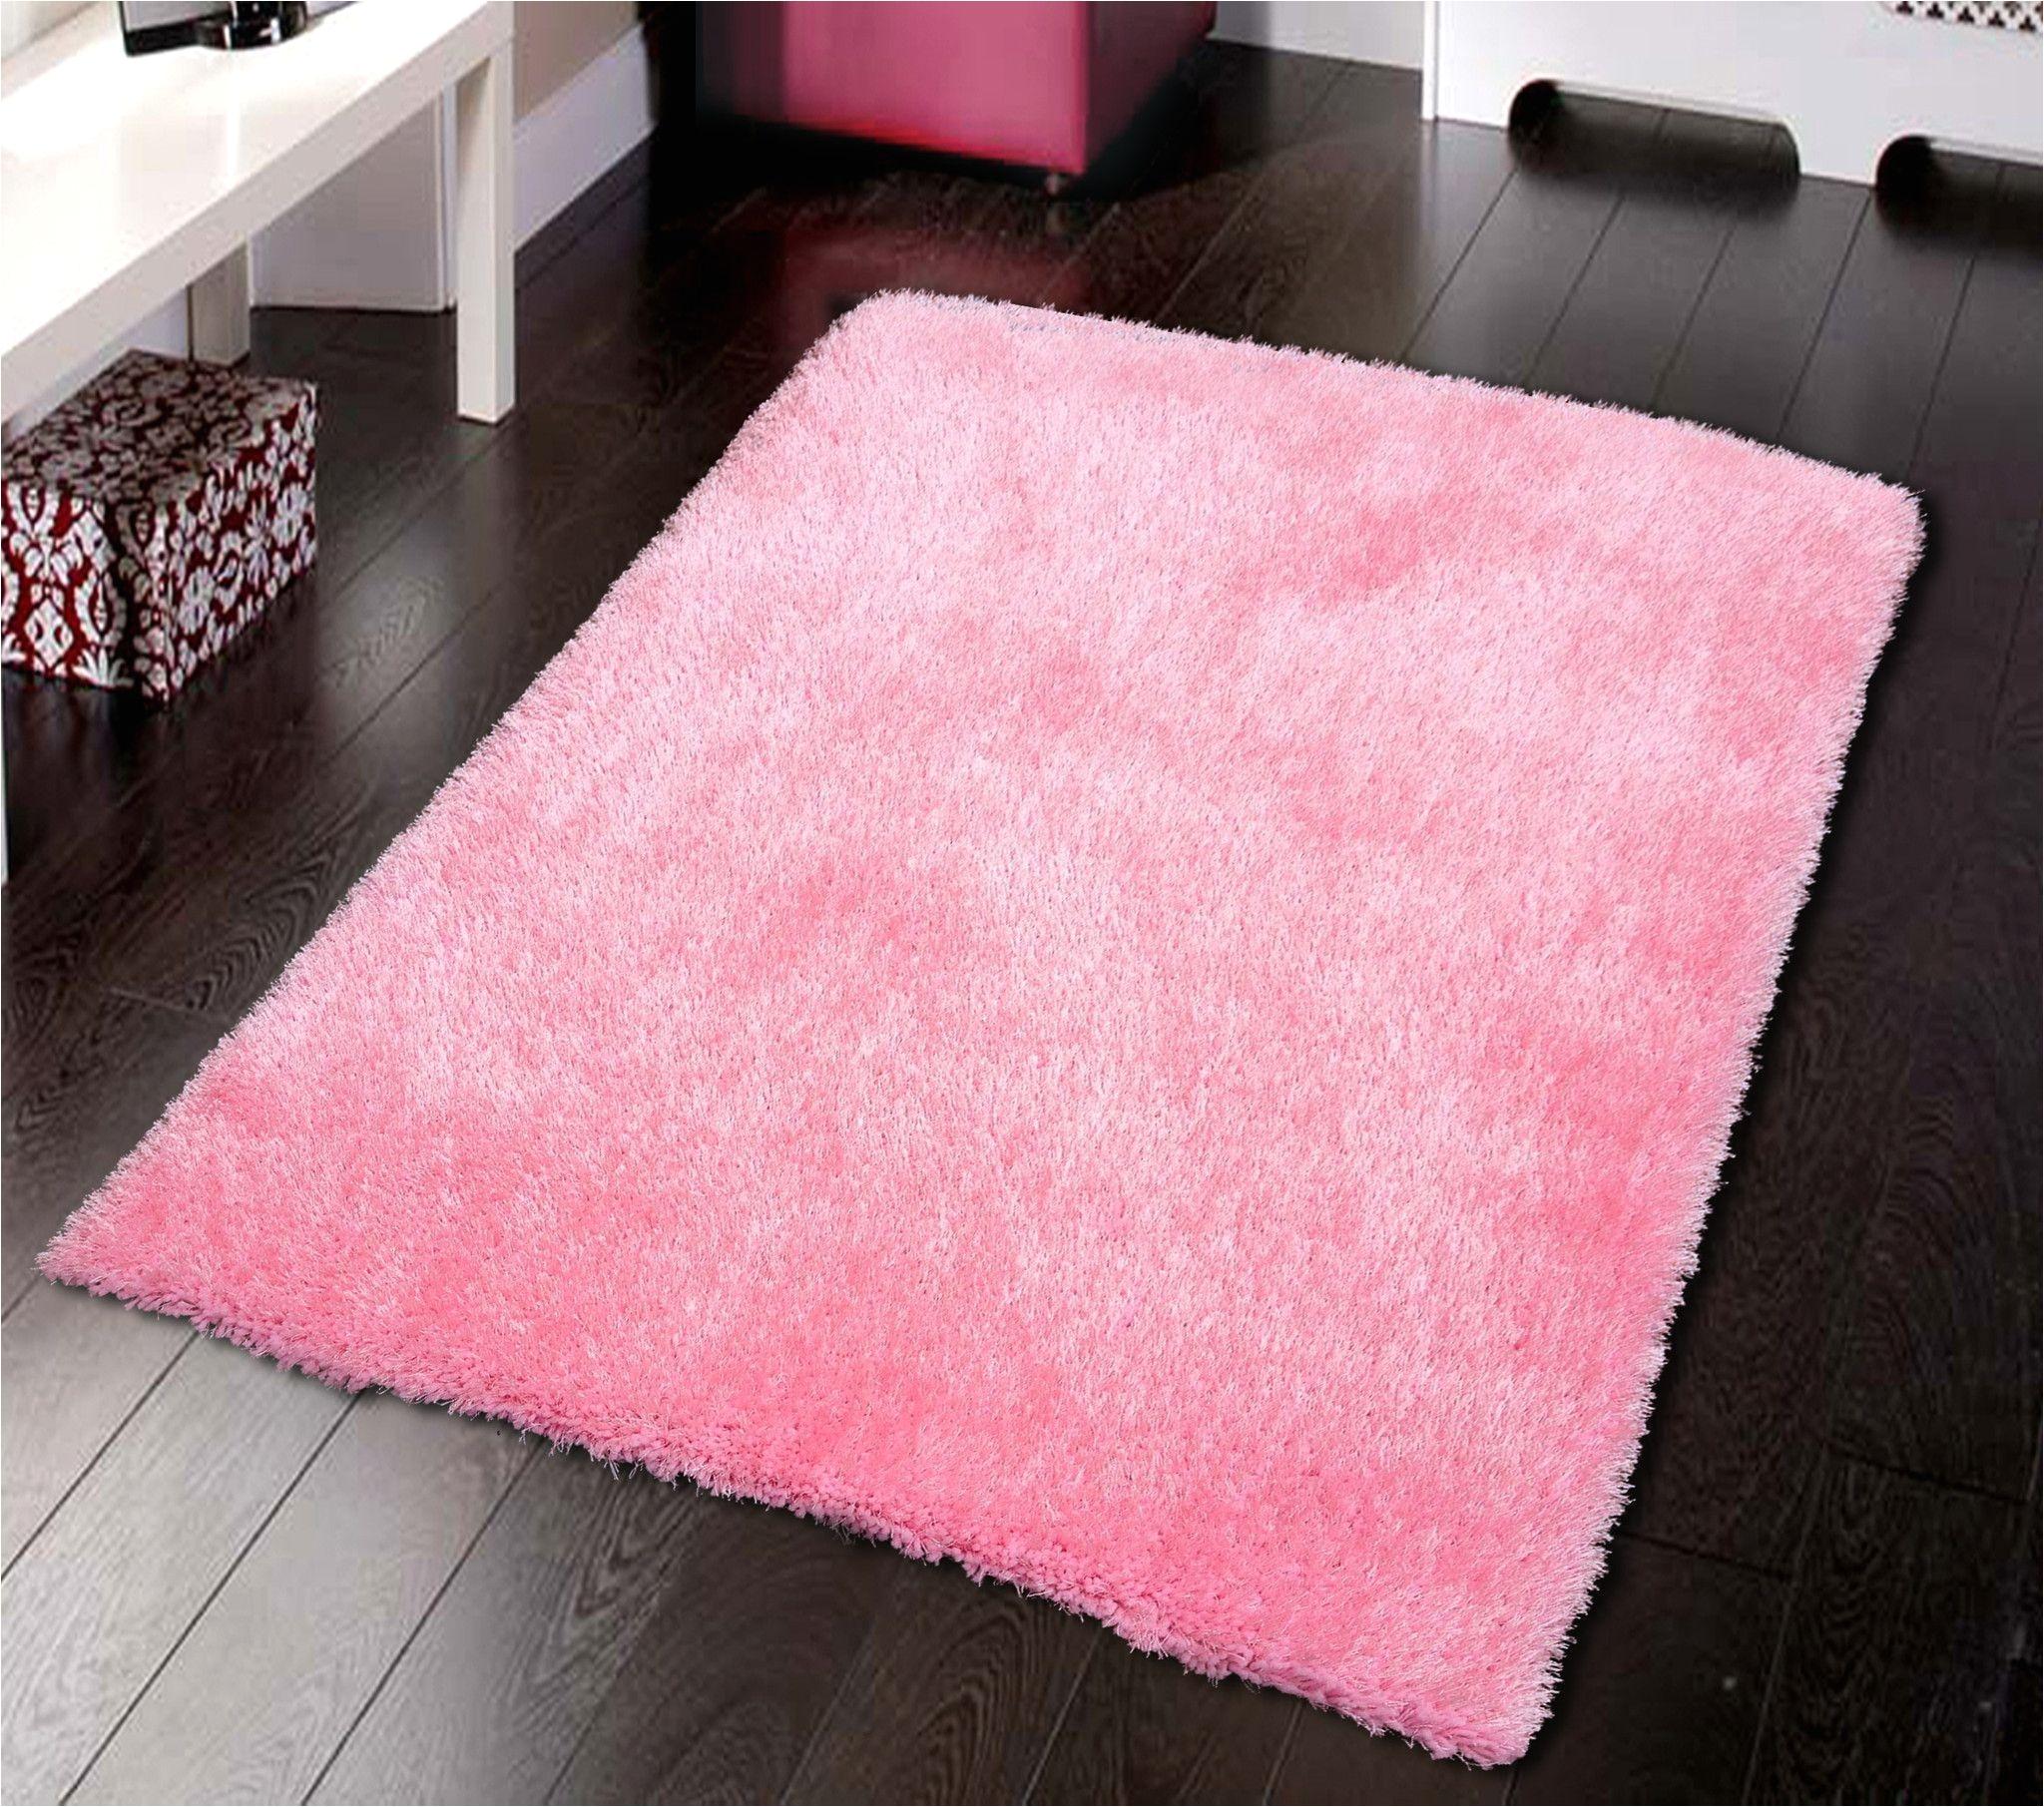 solid pink shag rug